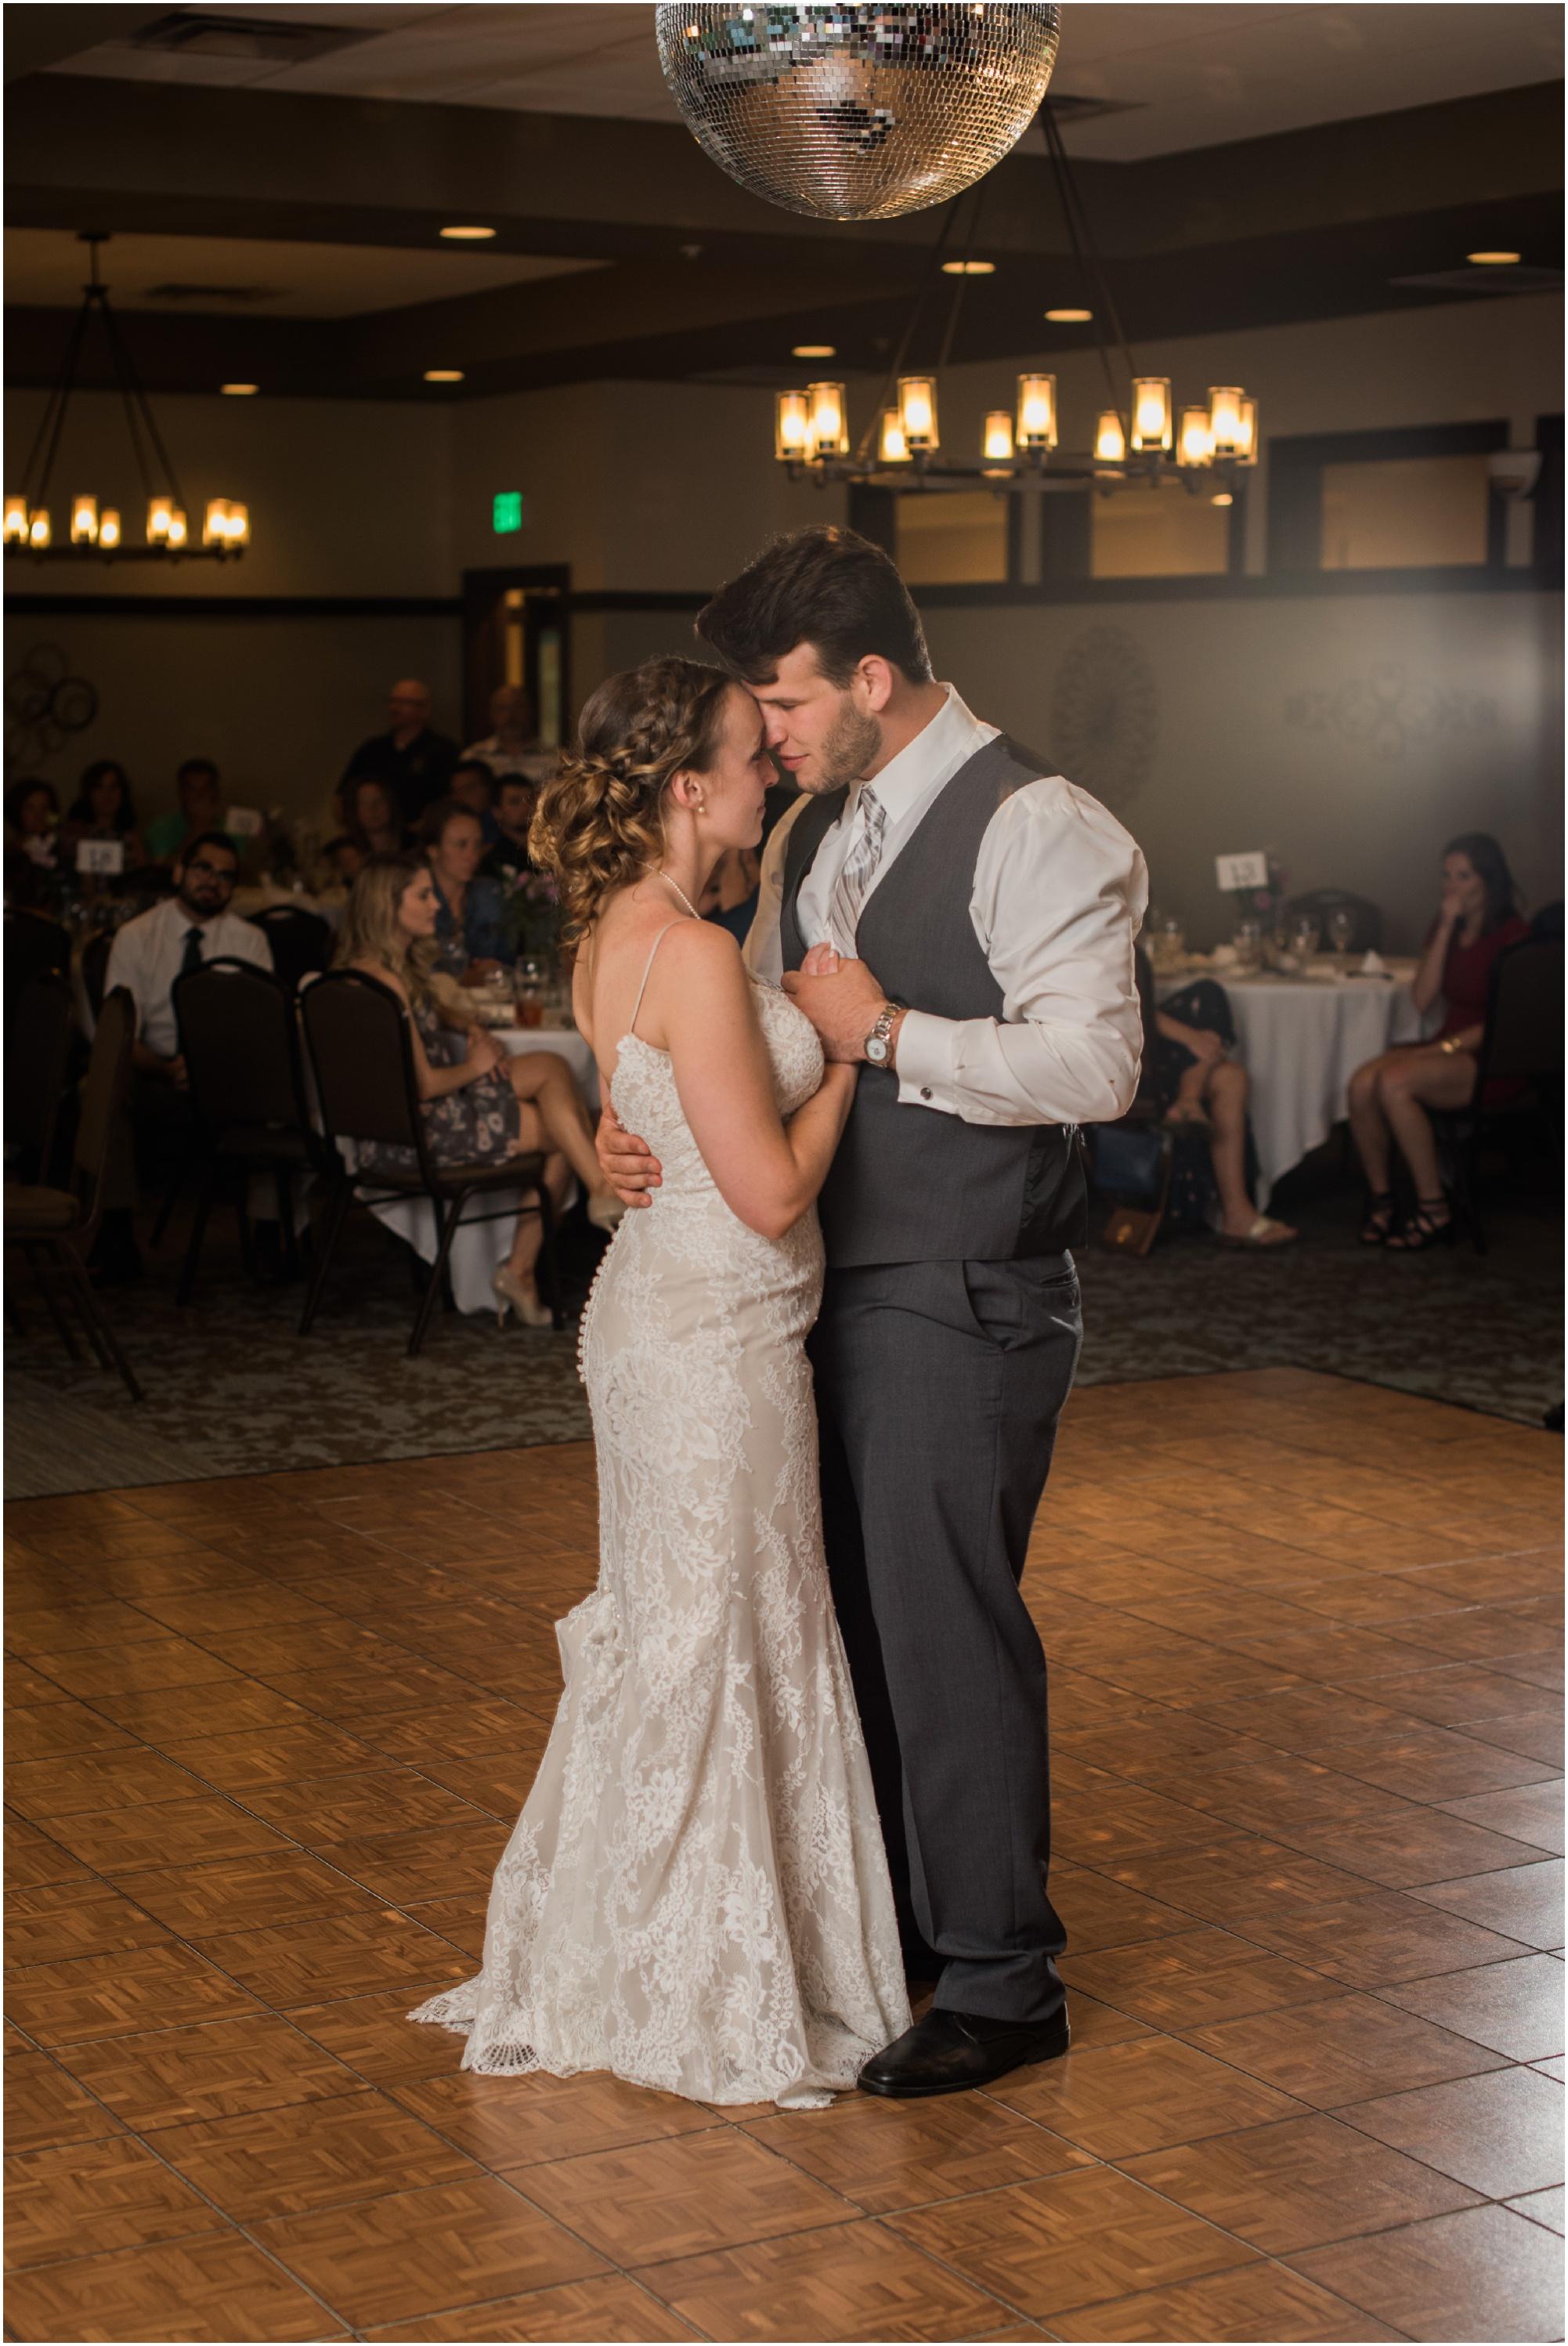 Wisconsin-Wedding-Photographer-Reedsburg-Country-Club-Kaela-and Matt-Wedding-966.jpg